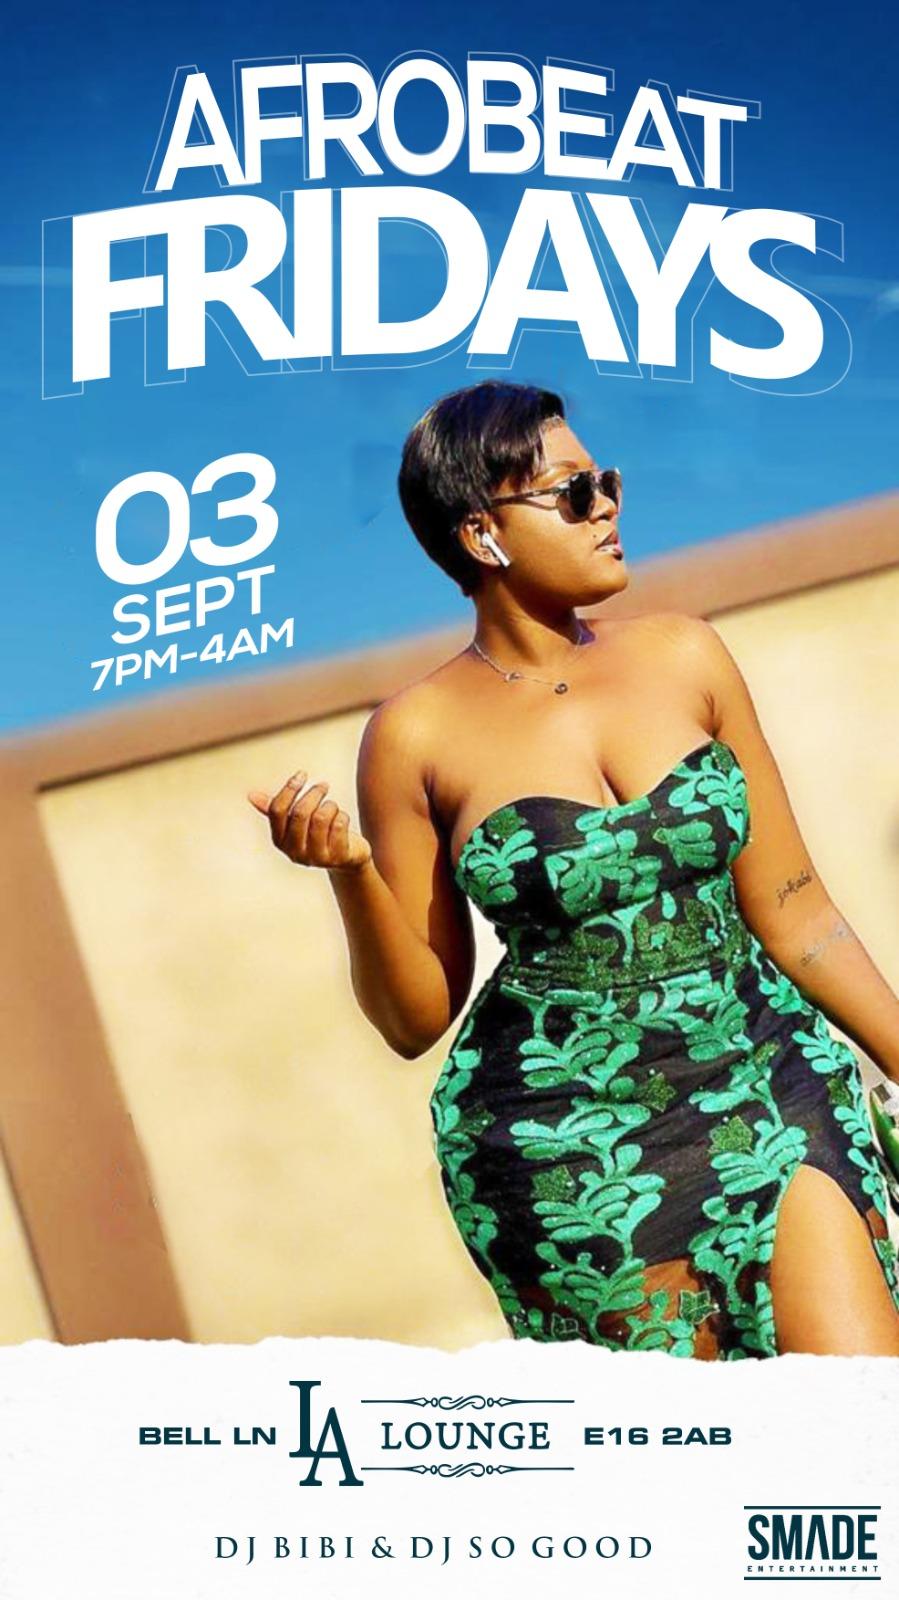 AfroBeat Fridays SEP 03